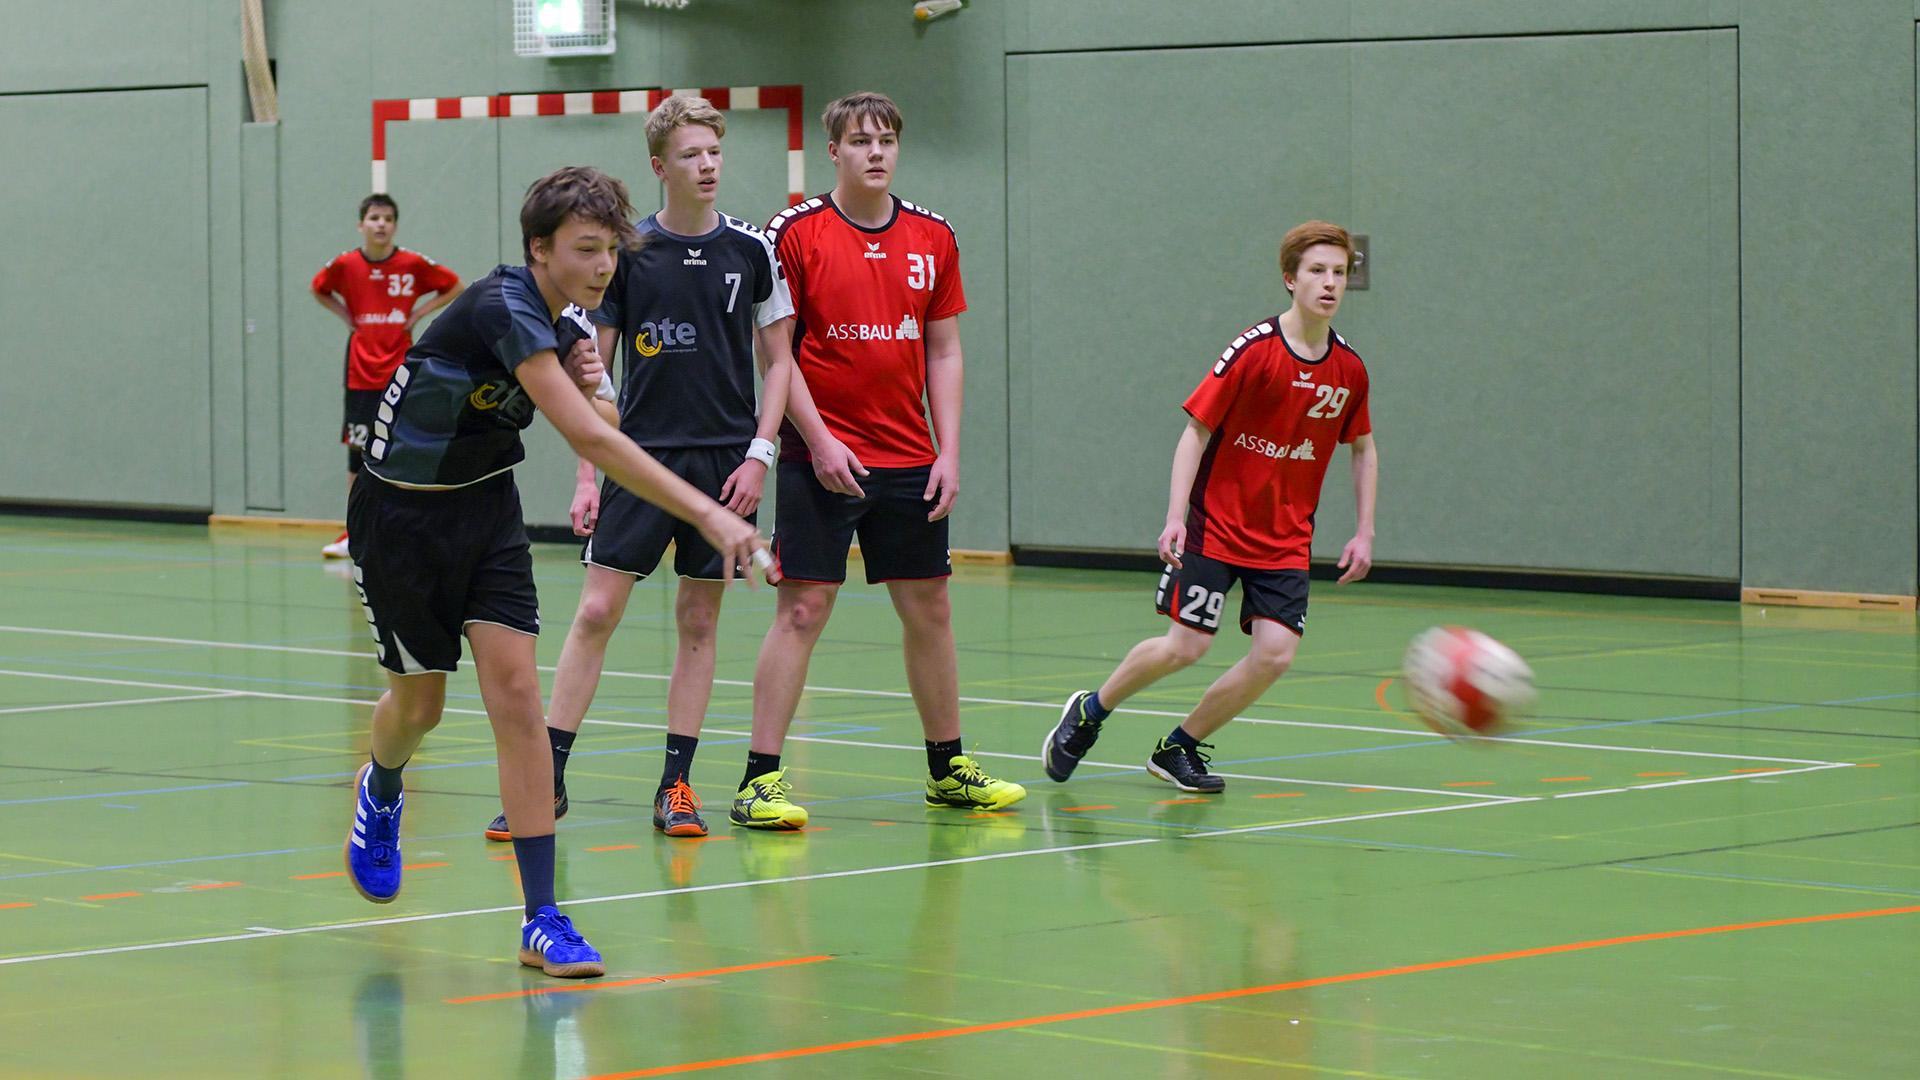 077Slider_mA_tsg_leutkirch_handball